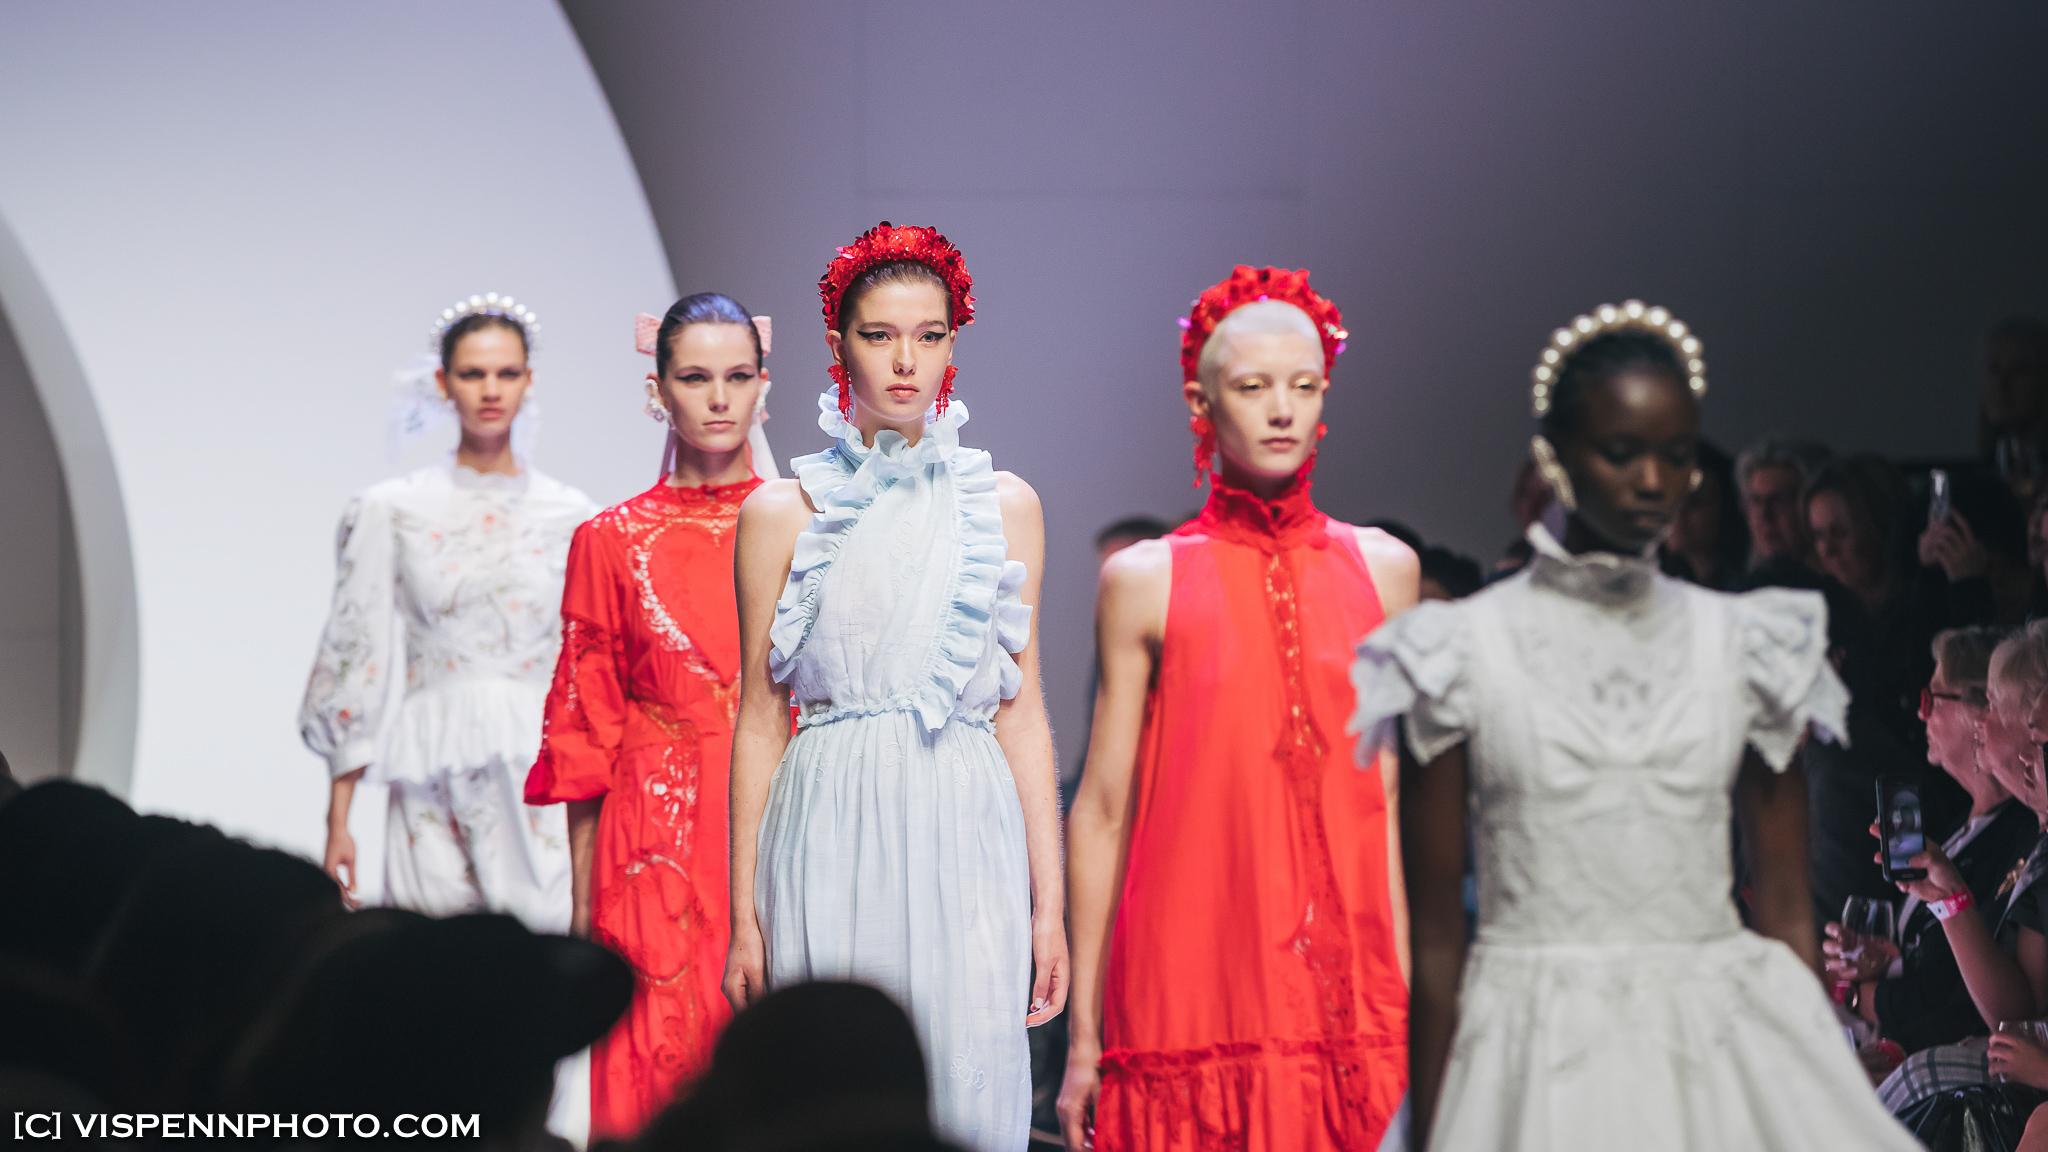 Melbourne Events Photography VISPENN 墨尔本 活动摄影 年会拍摄 MFW 1P 01118 VISPENN